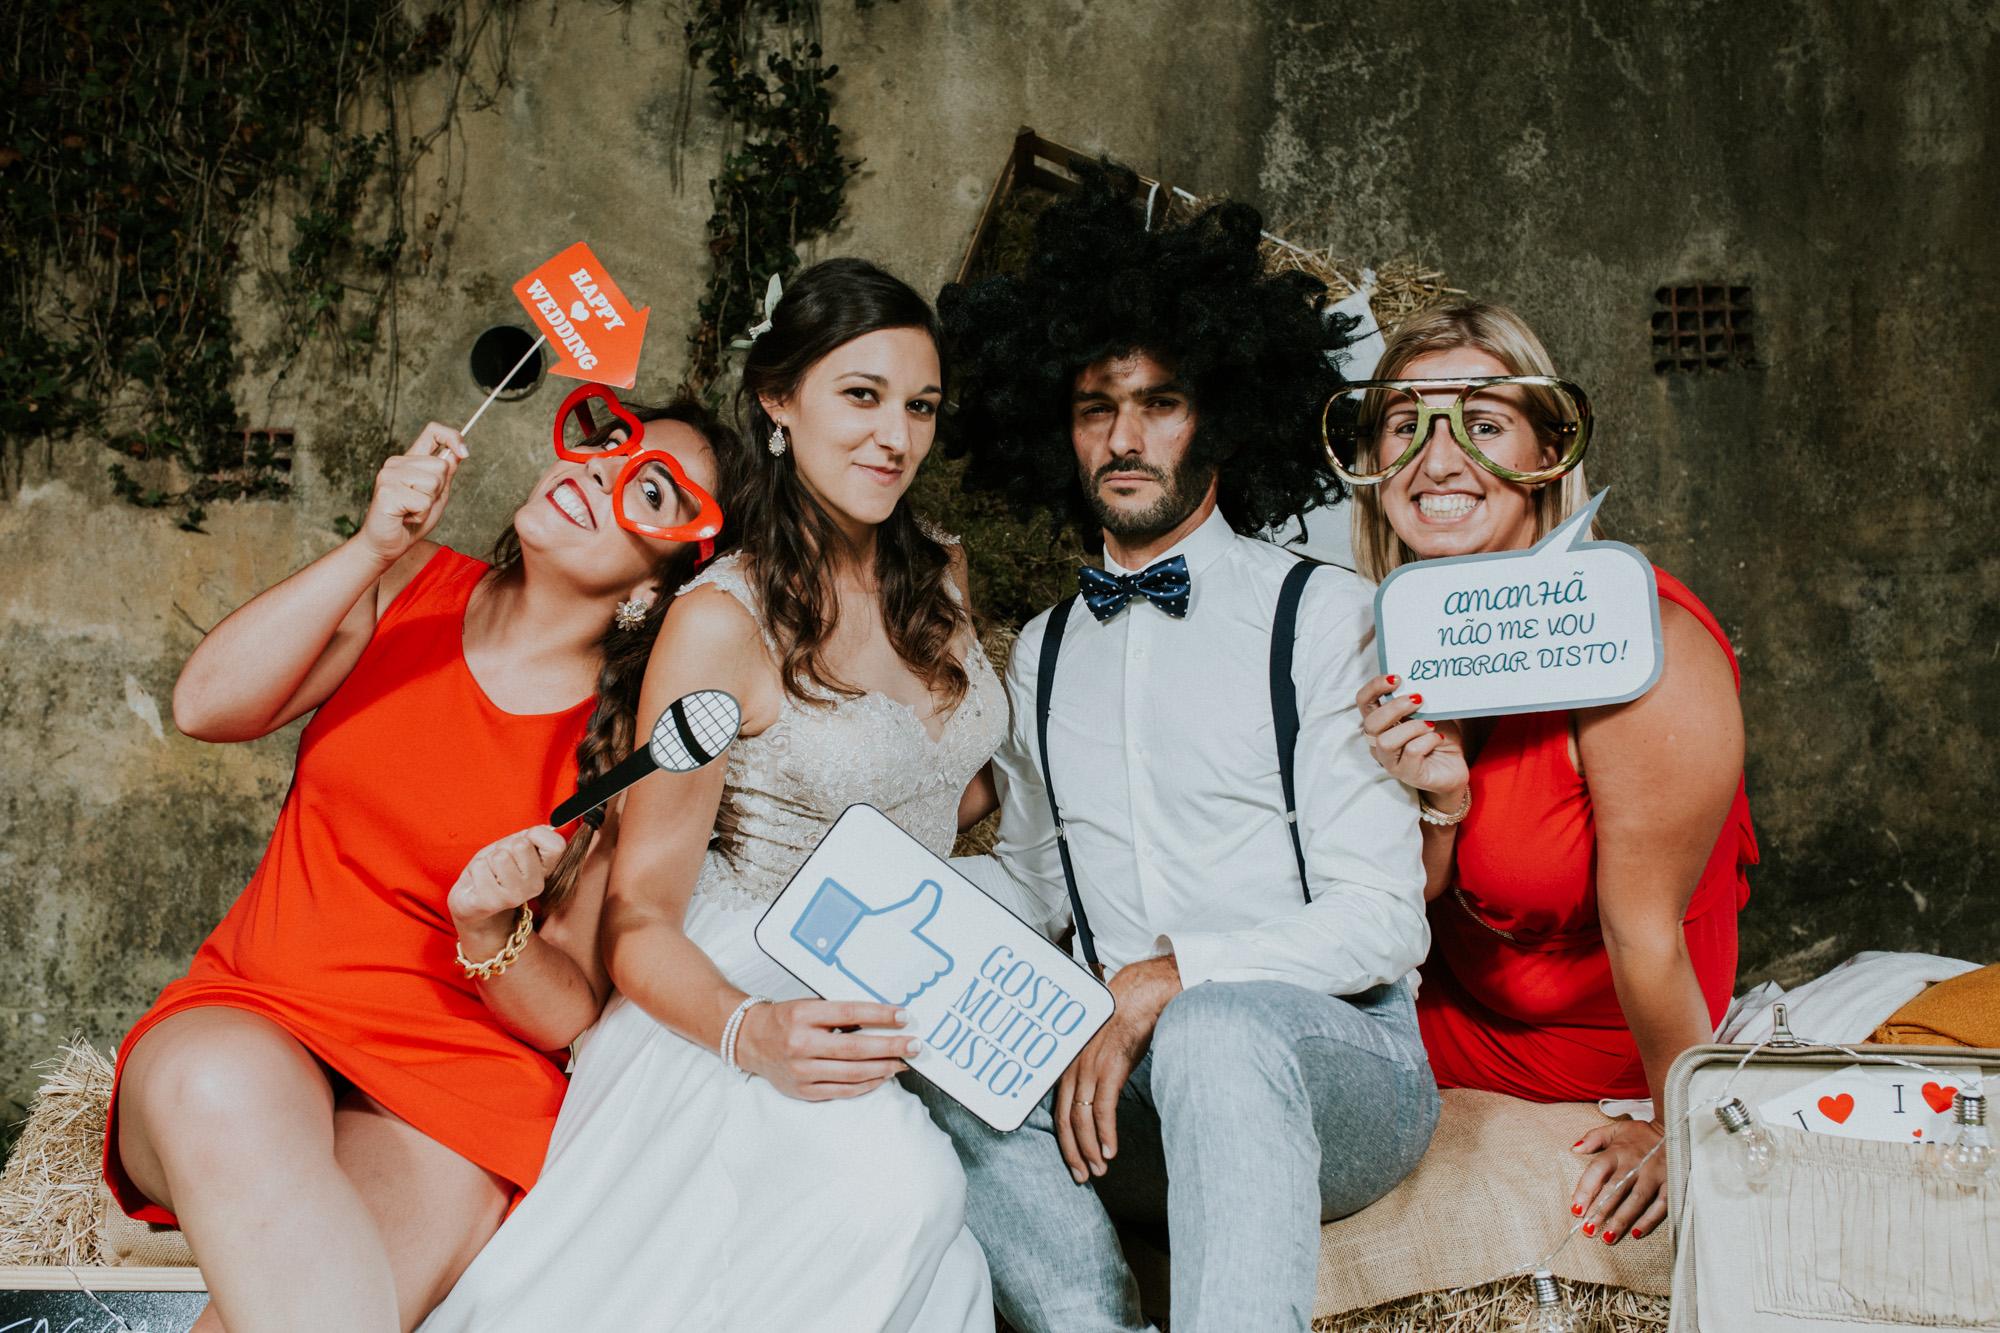 002-carina-e-samuel-wedding-casamento-quinta-dos-rouxinois-rustico-my-fancy-wedding-mafra-malveira-lisboa-sintra-cascais-filipe-santiago-fotografia-fotografo-lifestyle-destination-portugal